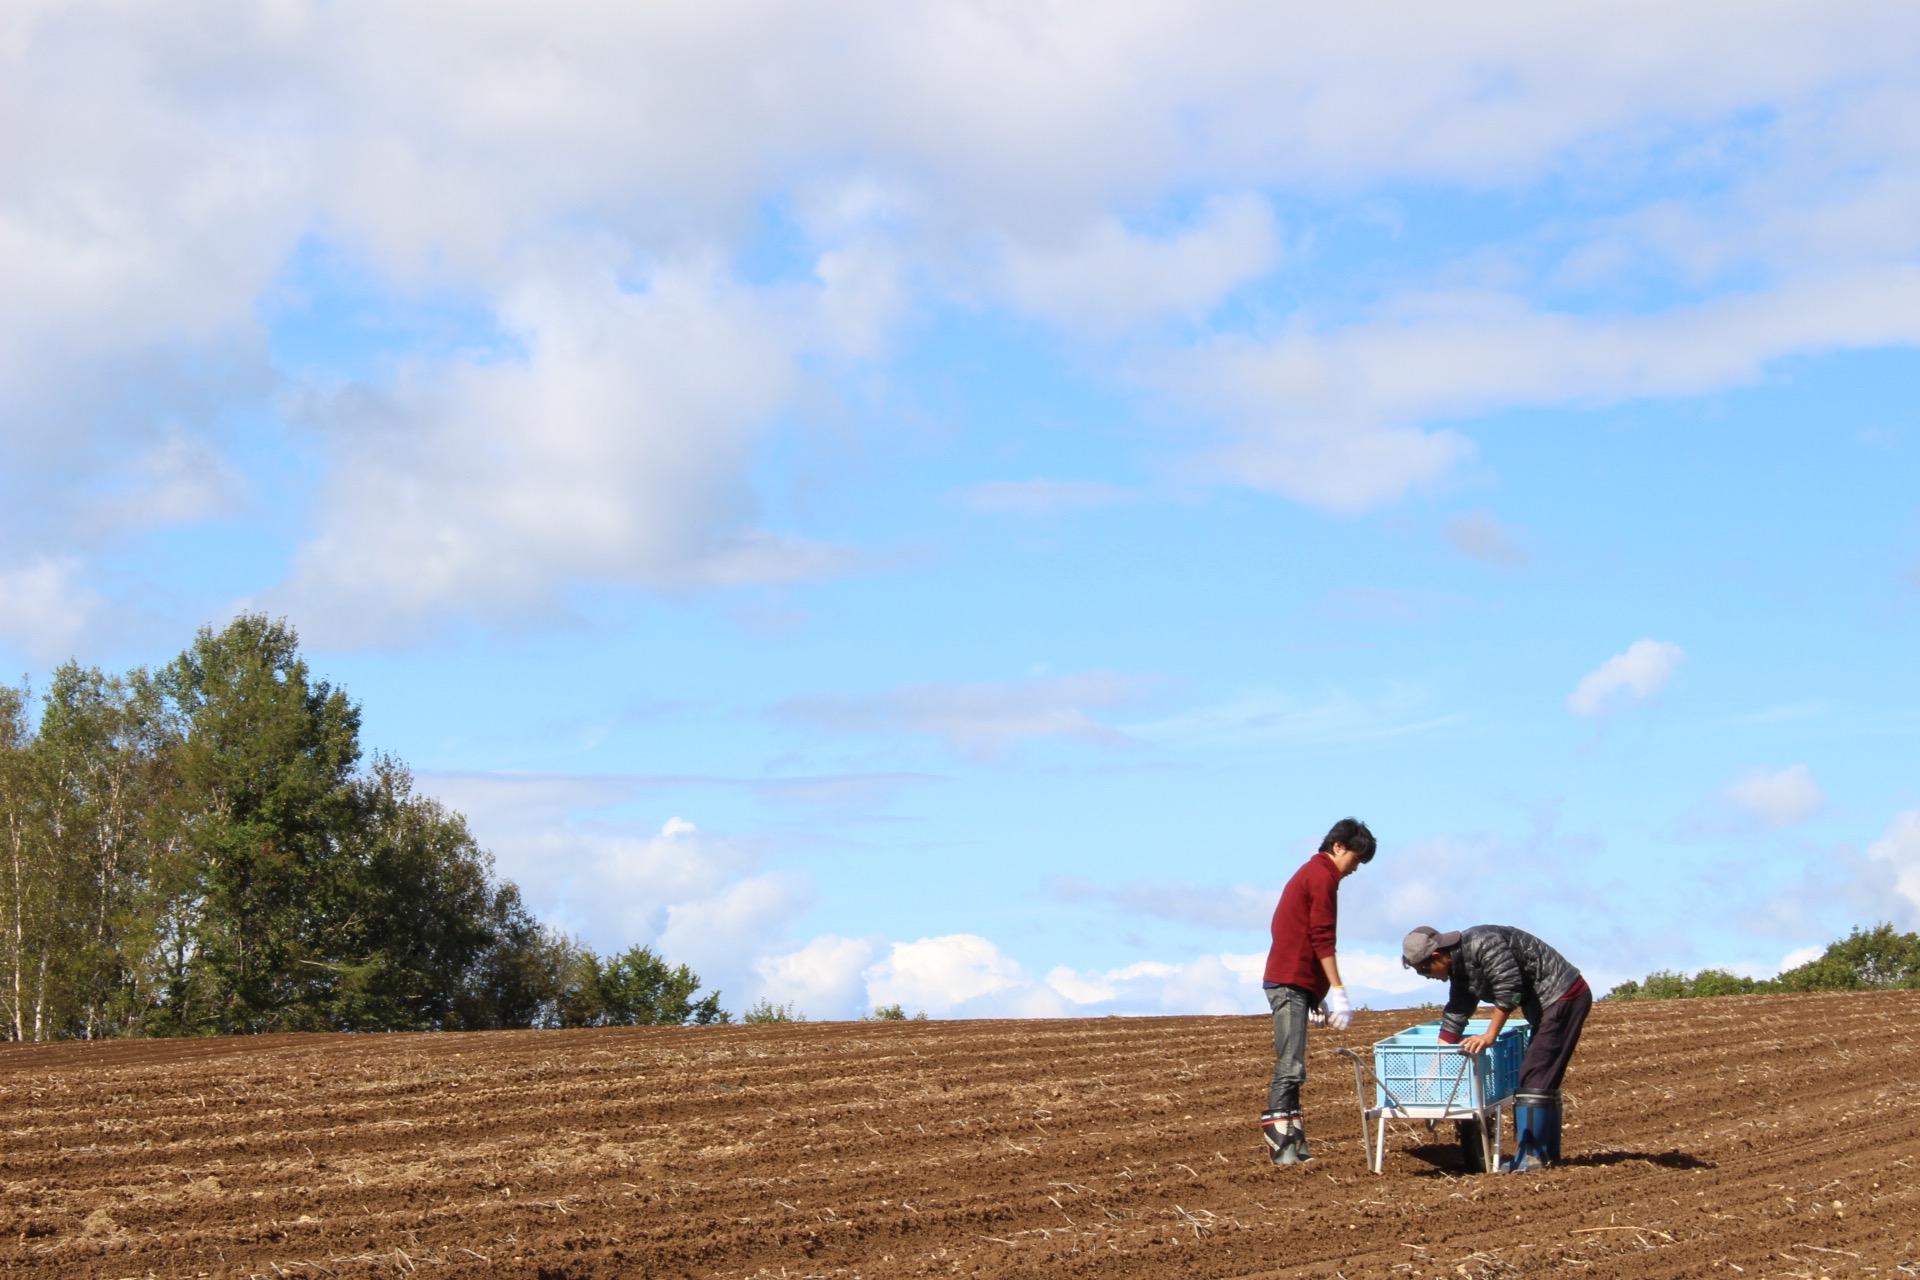 若山農園で畑仕事